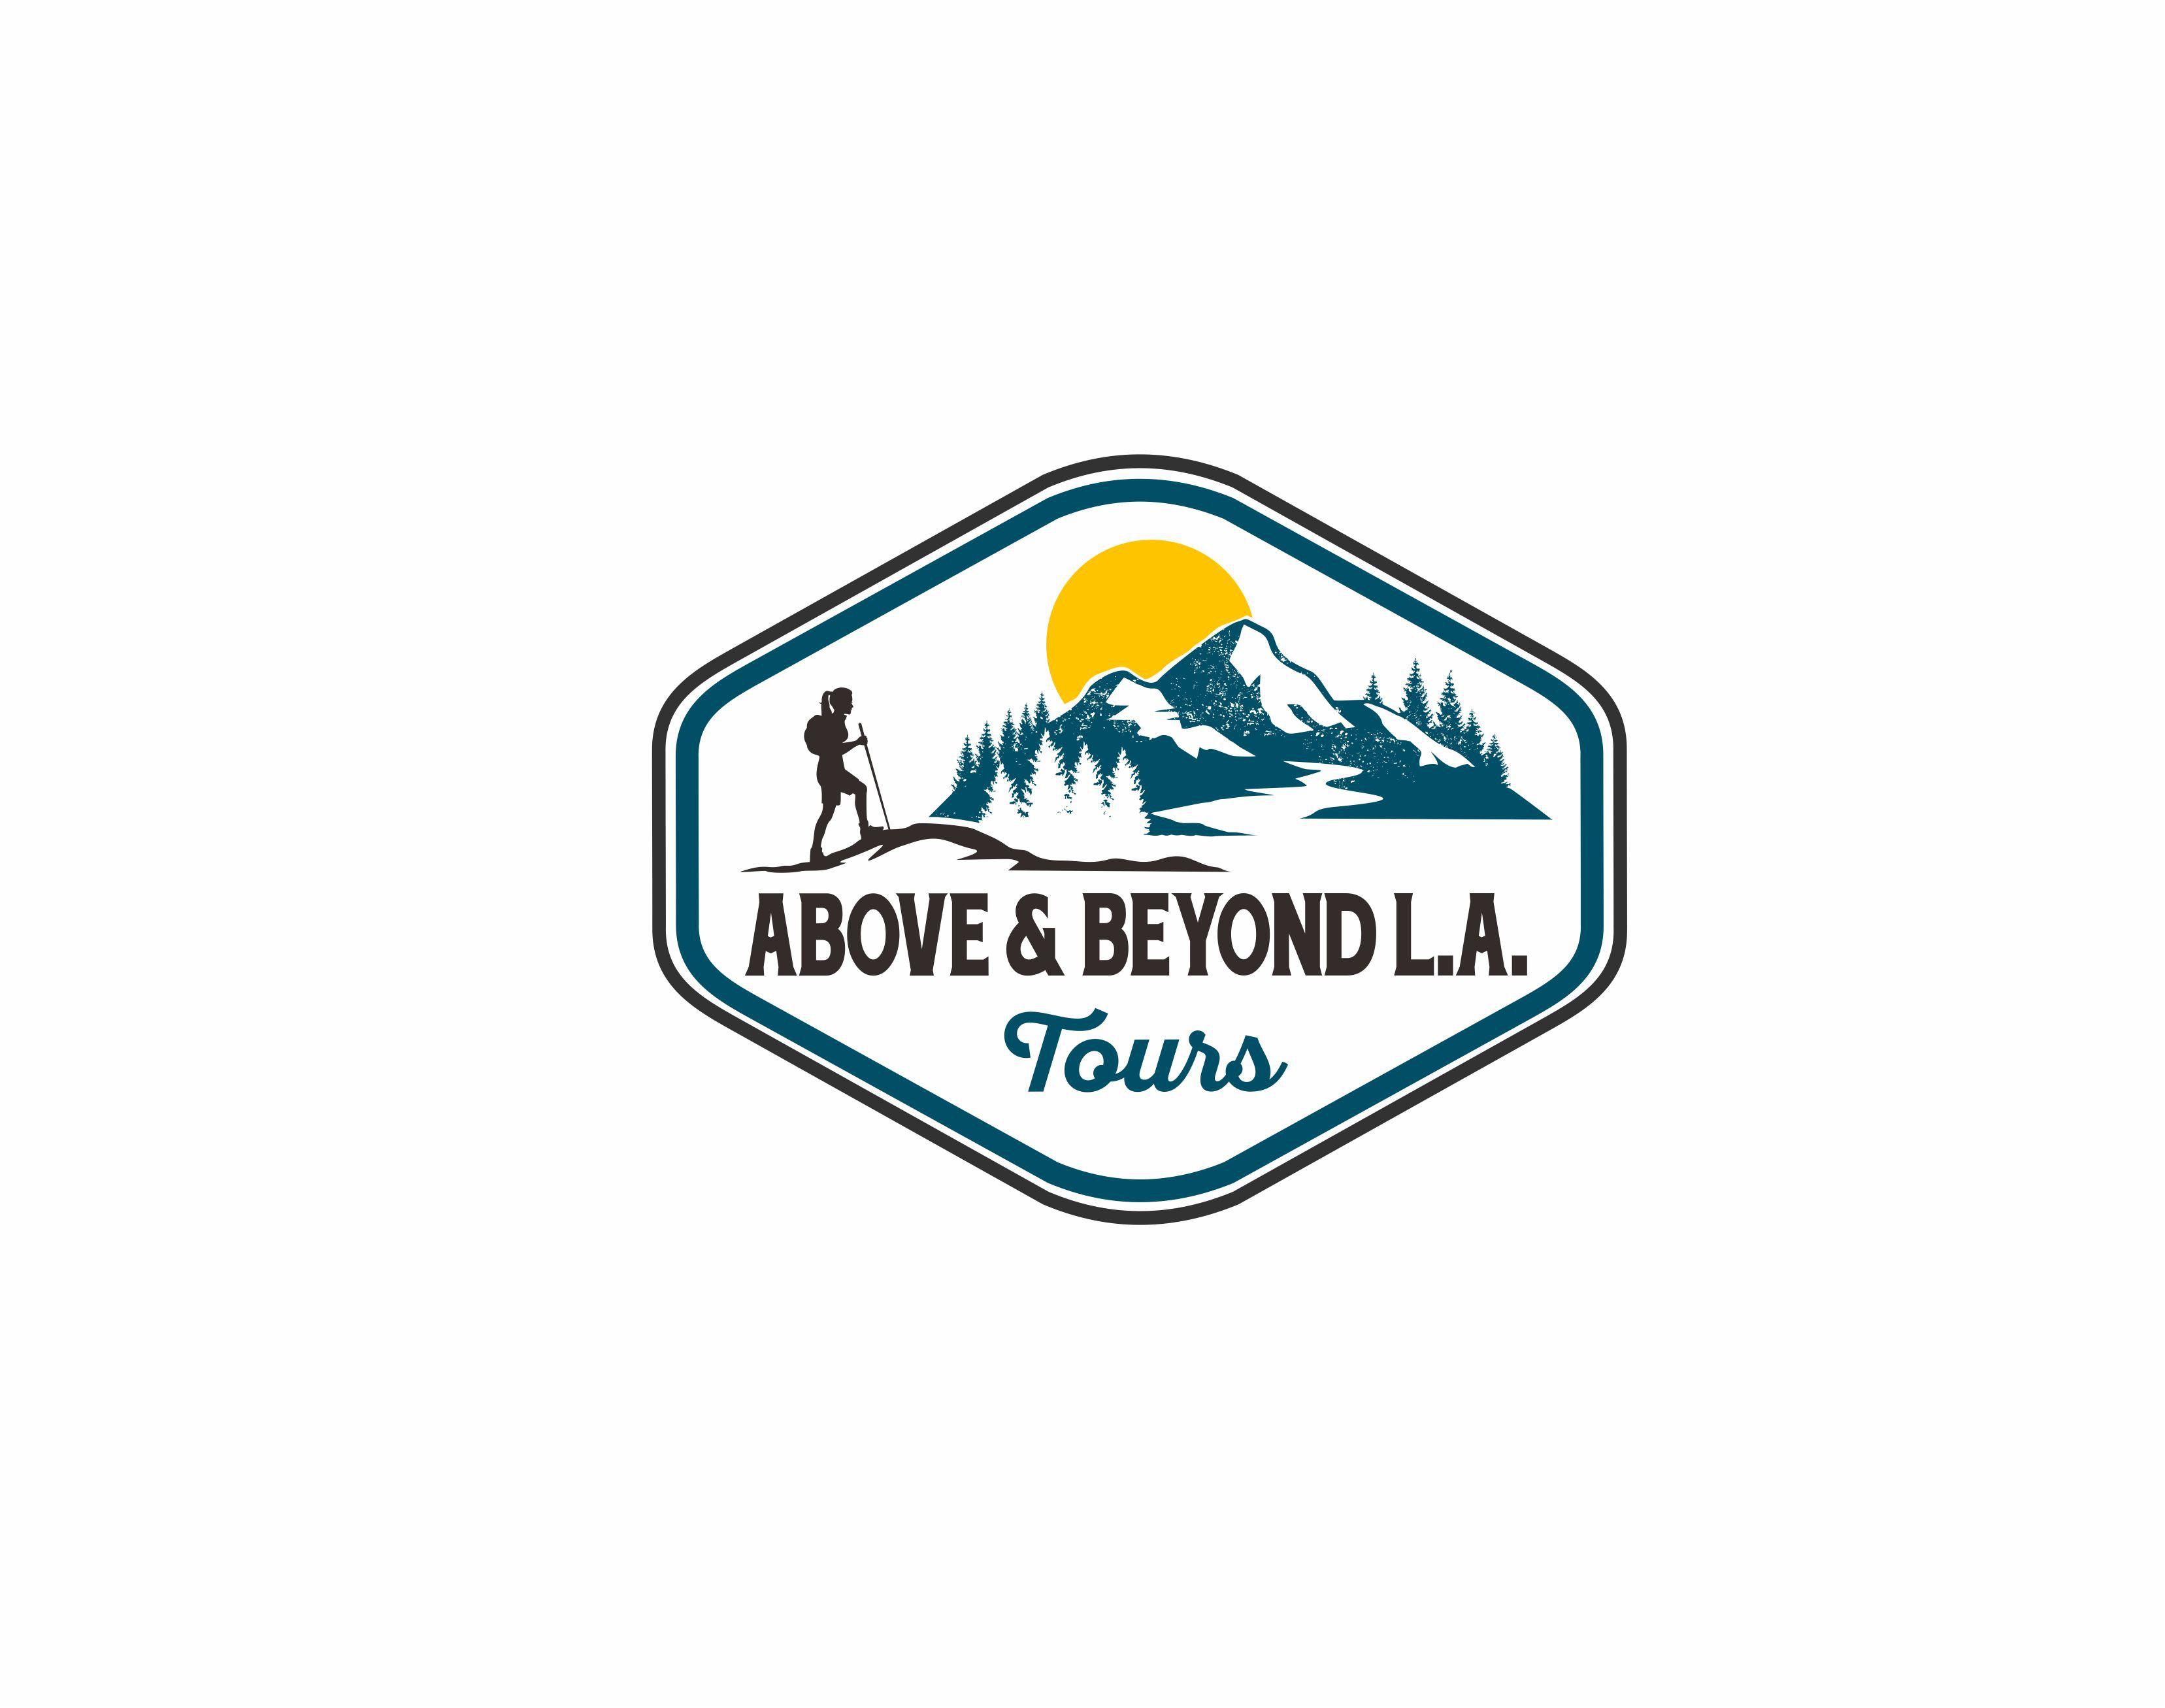 Mountain adventure logo